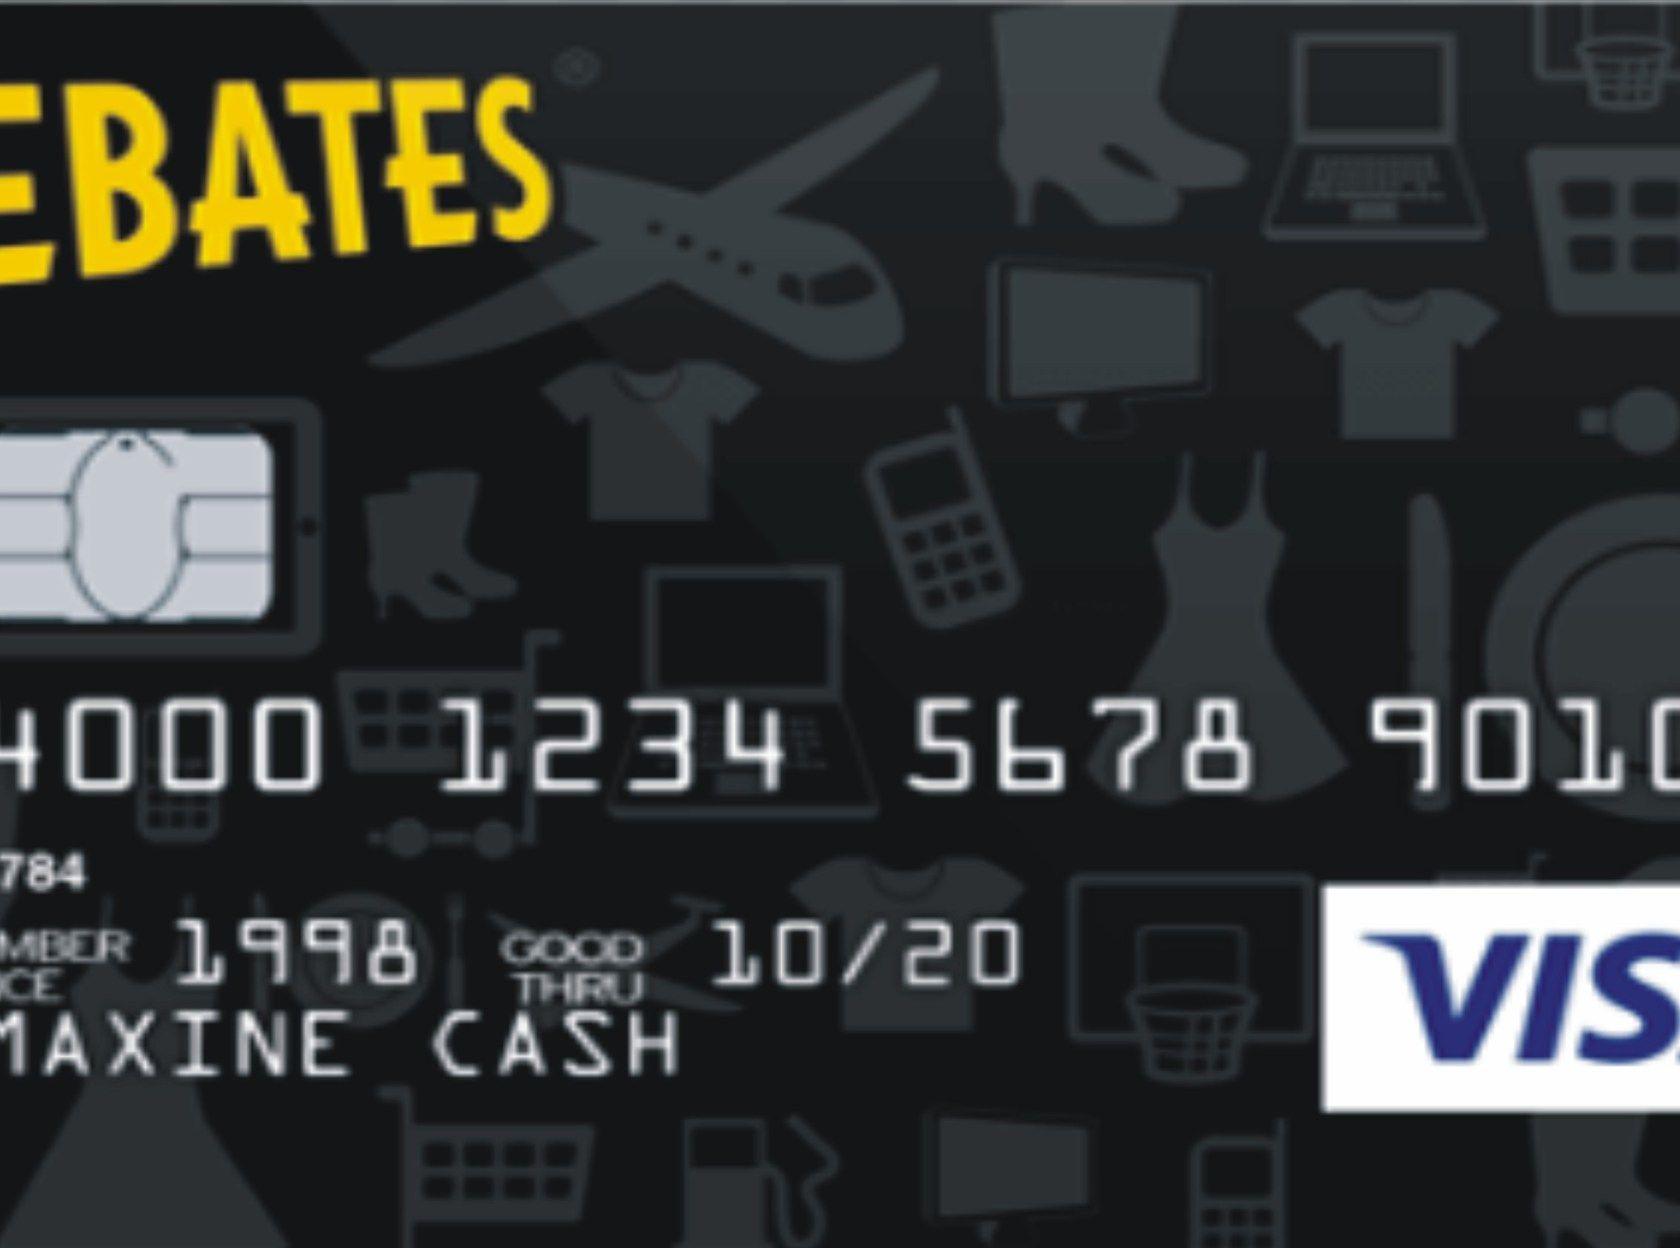 Ebates Credit Card Rewards Credit Cards Credit Card Credit